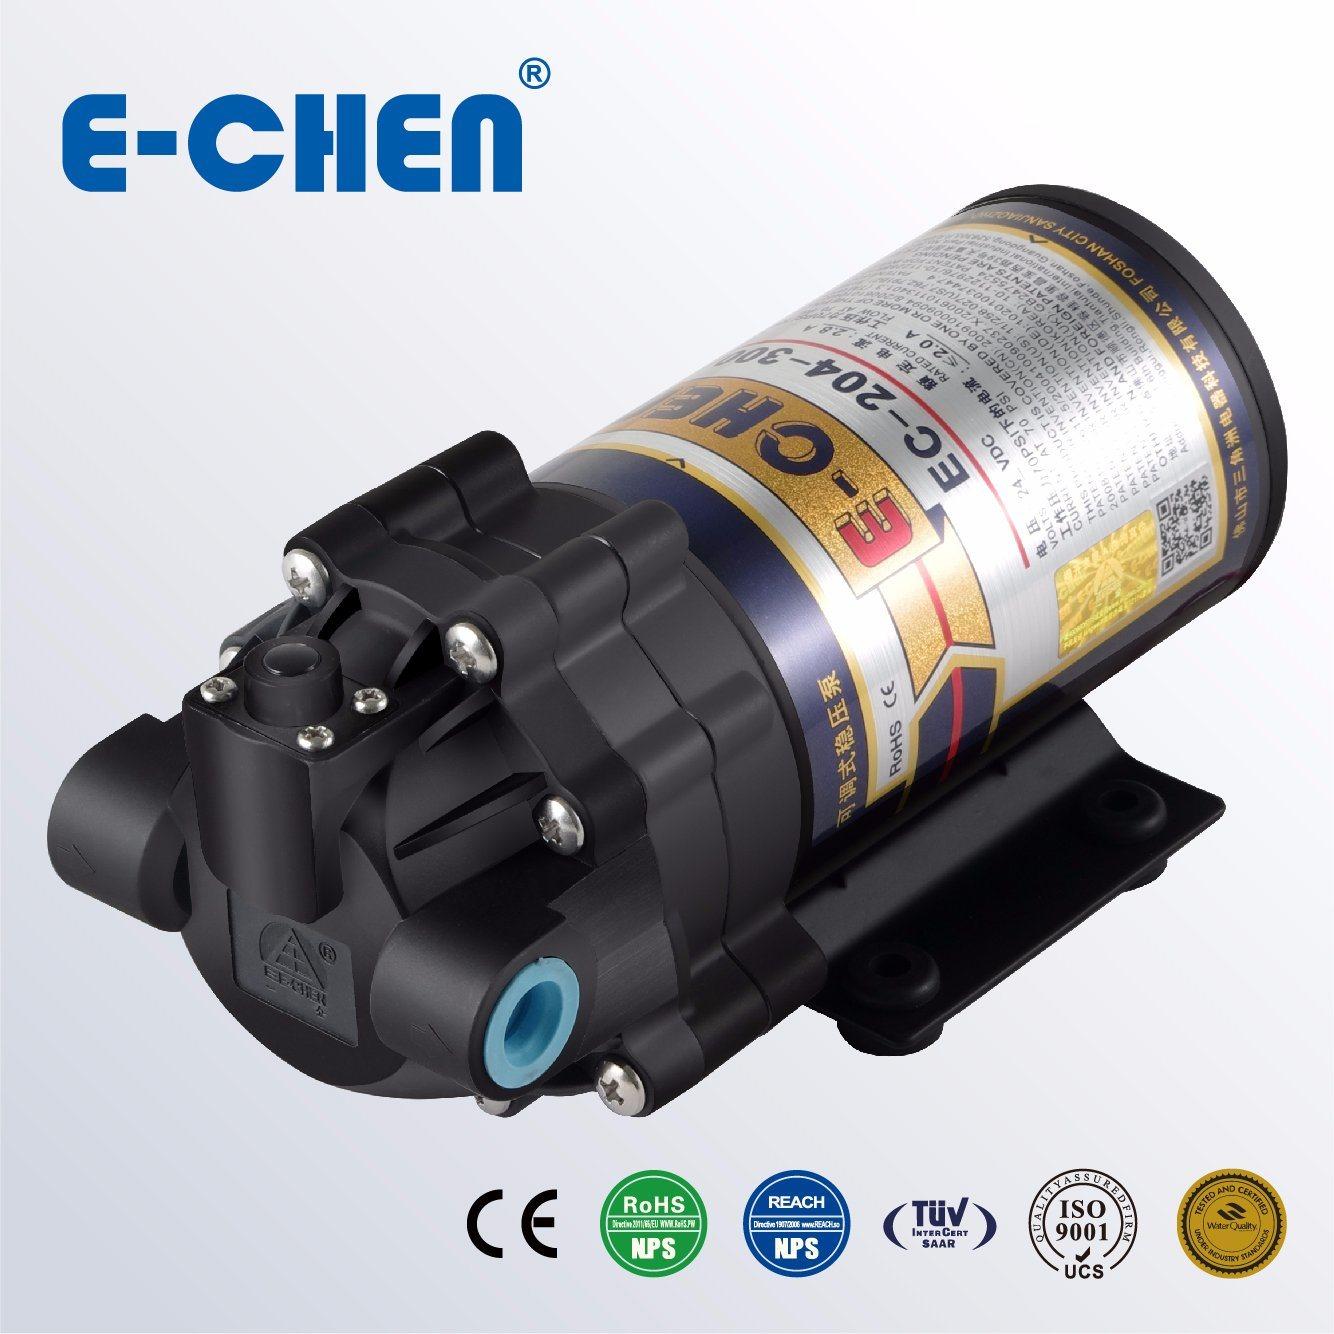 E-Chen 204 Series 400gpd Diaphragm RO Booster Pump - Self Priming Self Pressure Regulating Water Pump